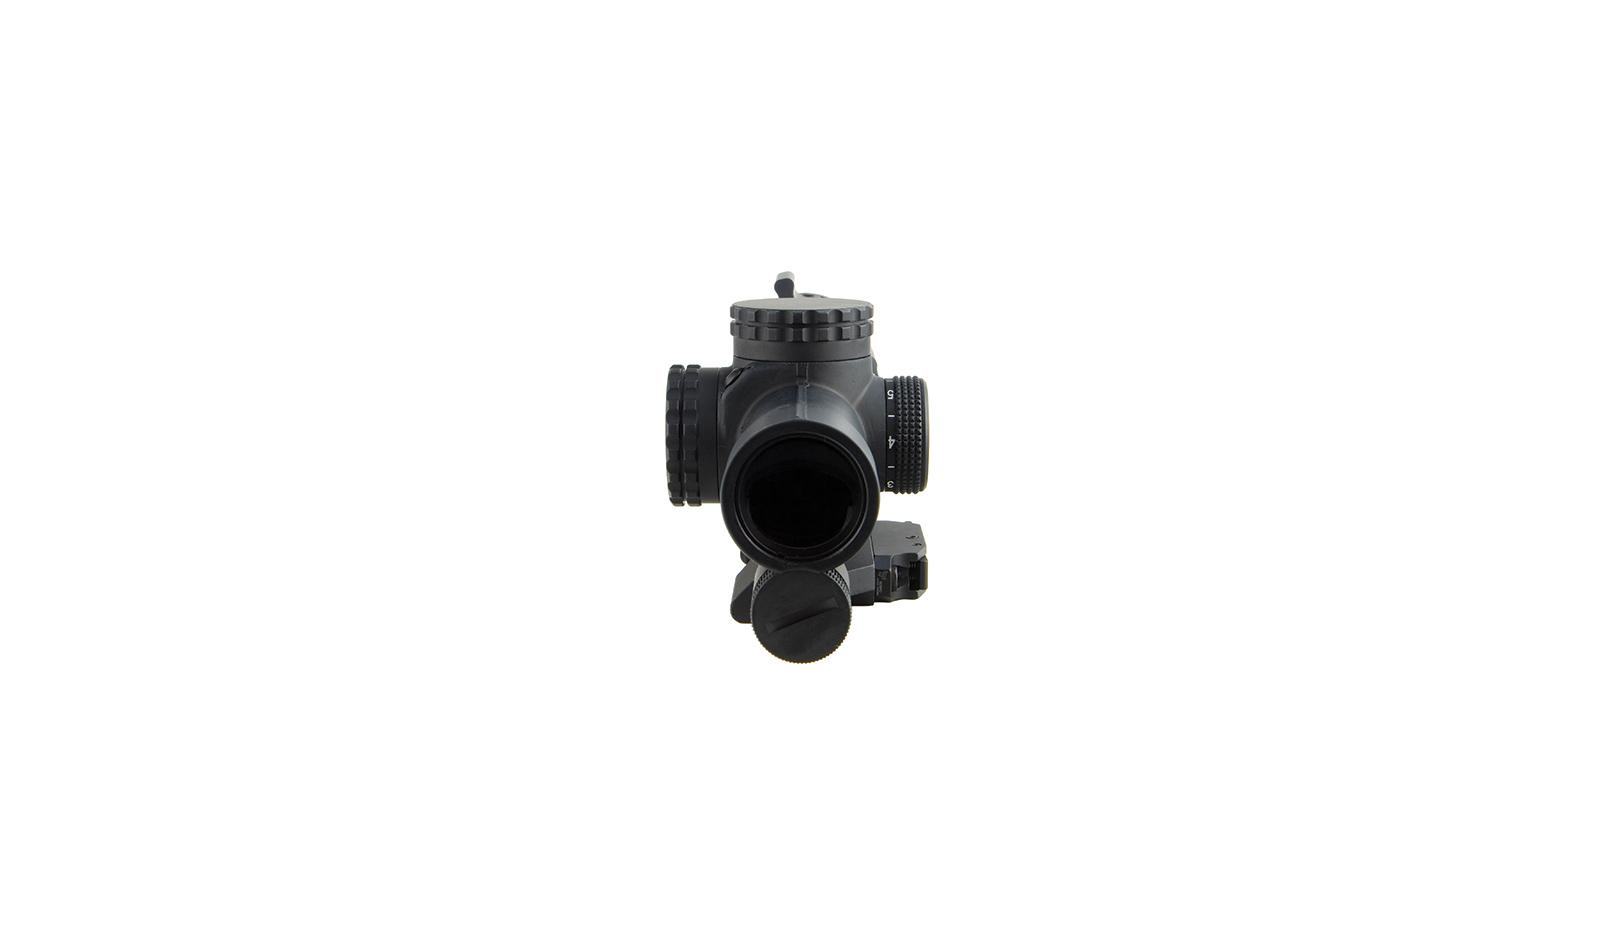 VC16-C-1600049 angle 8